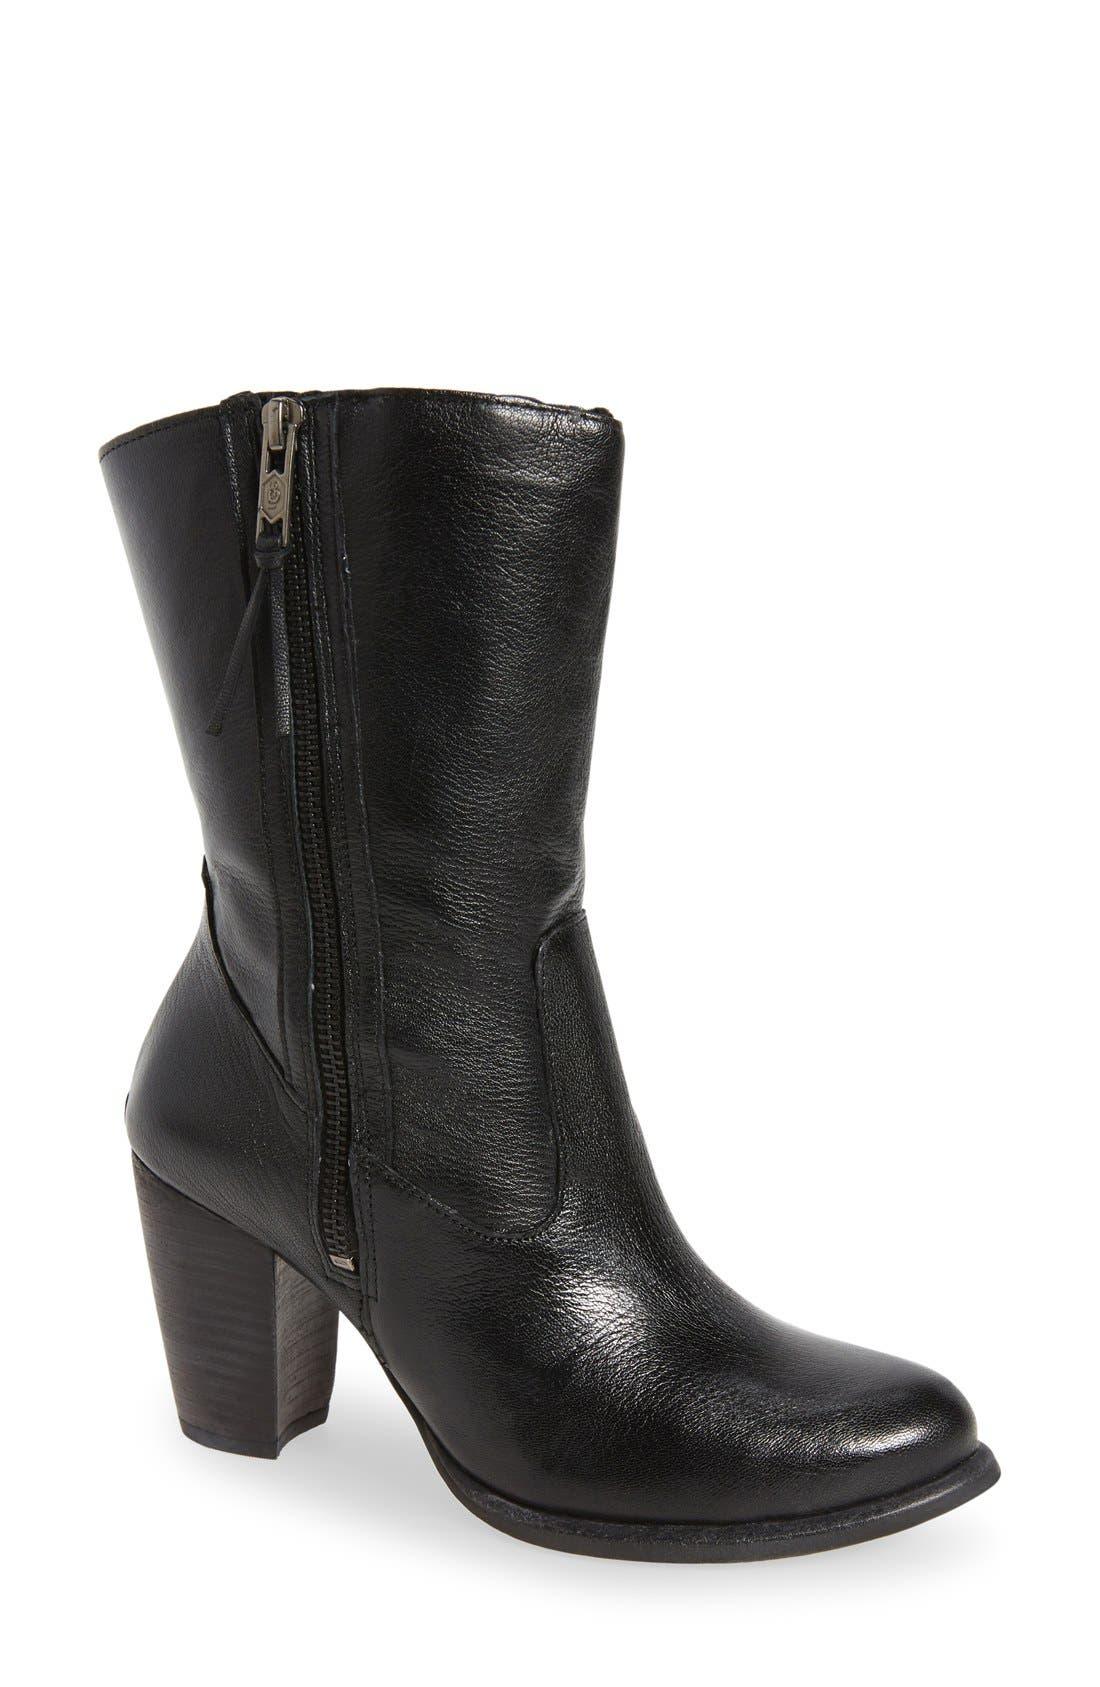 Alternate Image 1 Selected - UGG® 'Lynda' Block Heel Boot (Women)